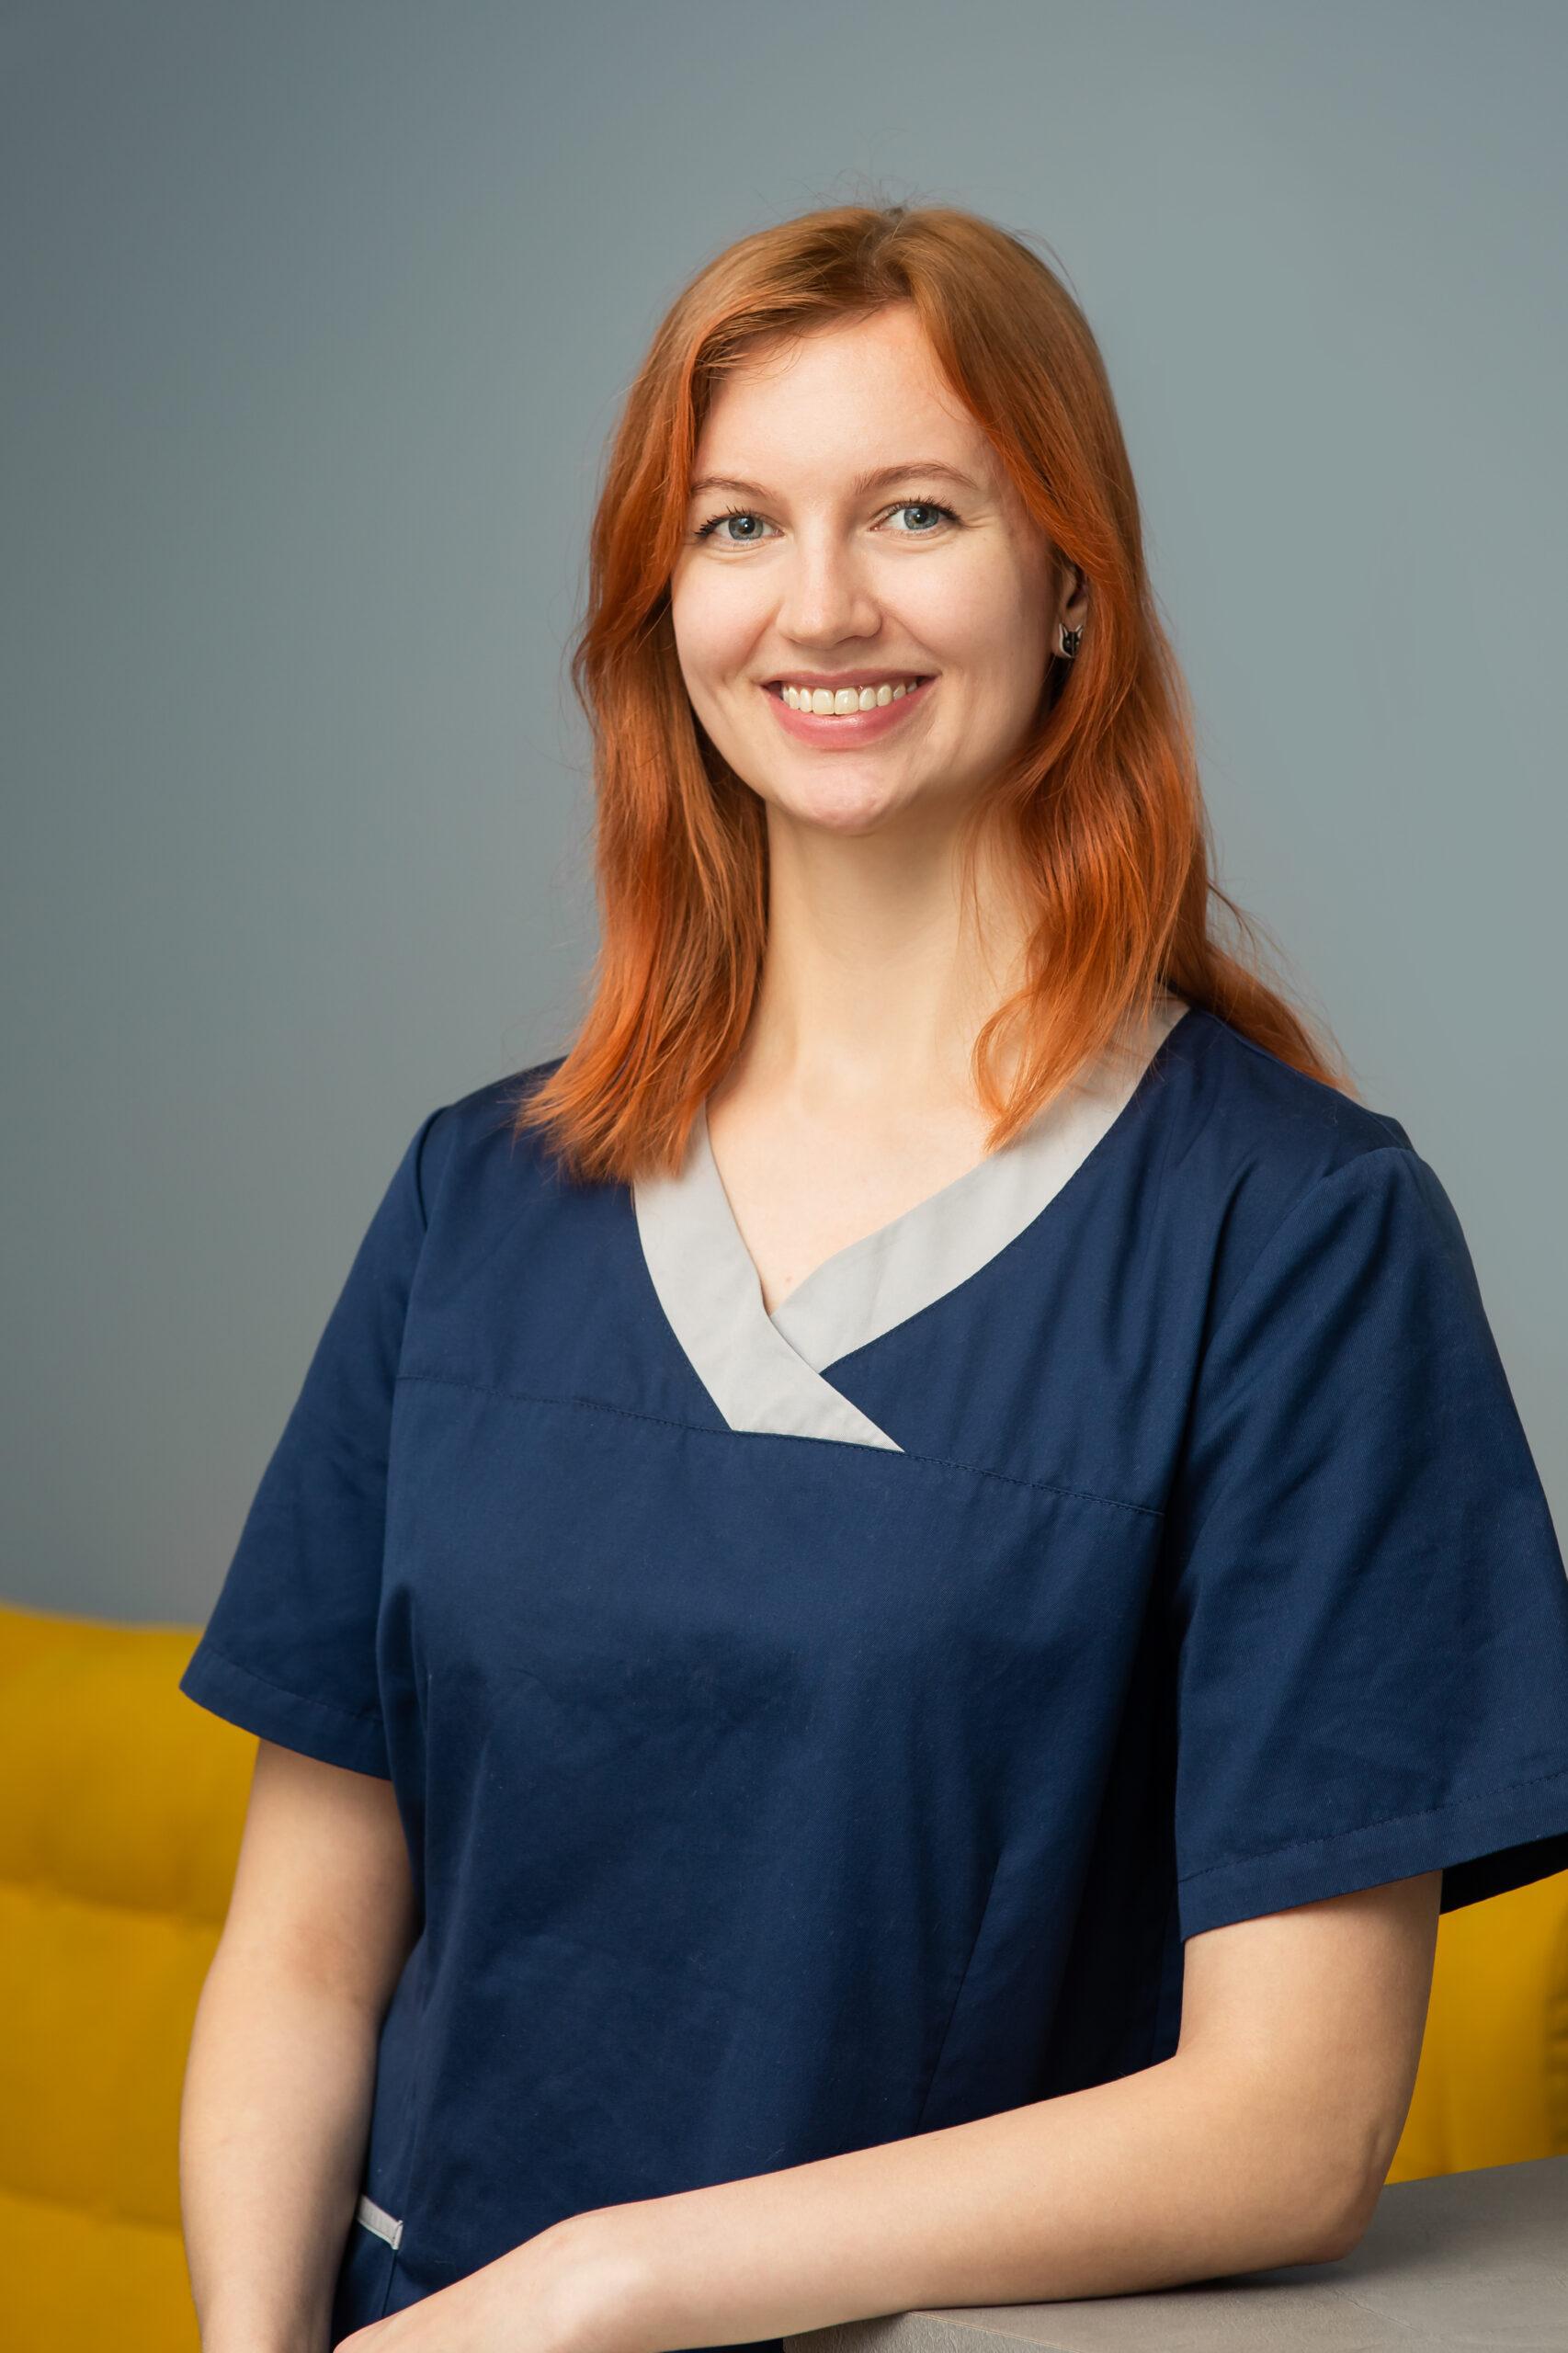 DR. EVA-LIISA RUUT